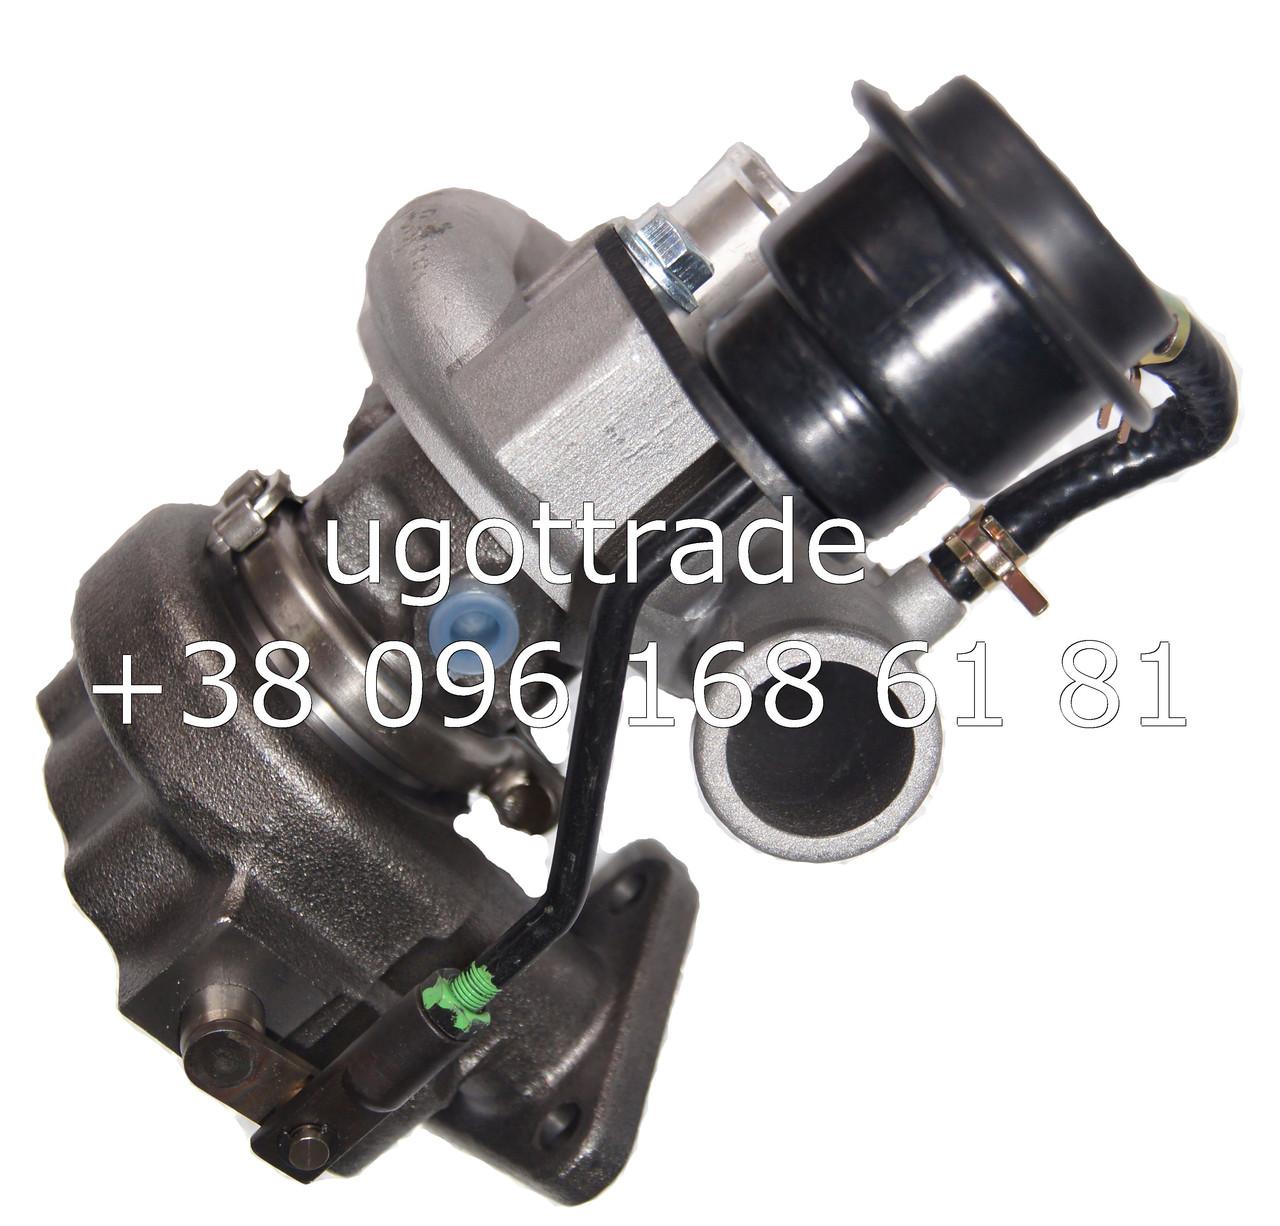 Турбокомпрессор TD025M-03-9T Mitsubishi, Hyundai Accent, Getz, Matrix 1.5 CRDI